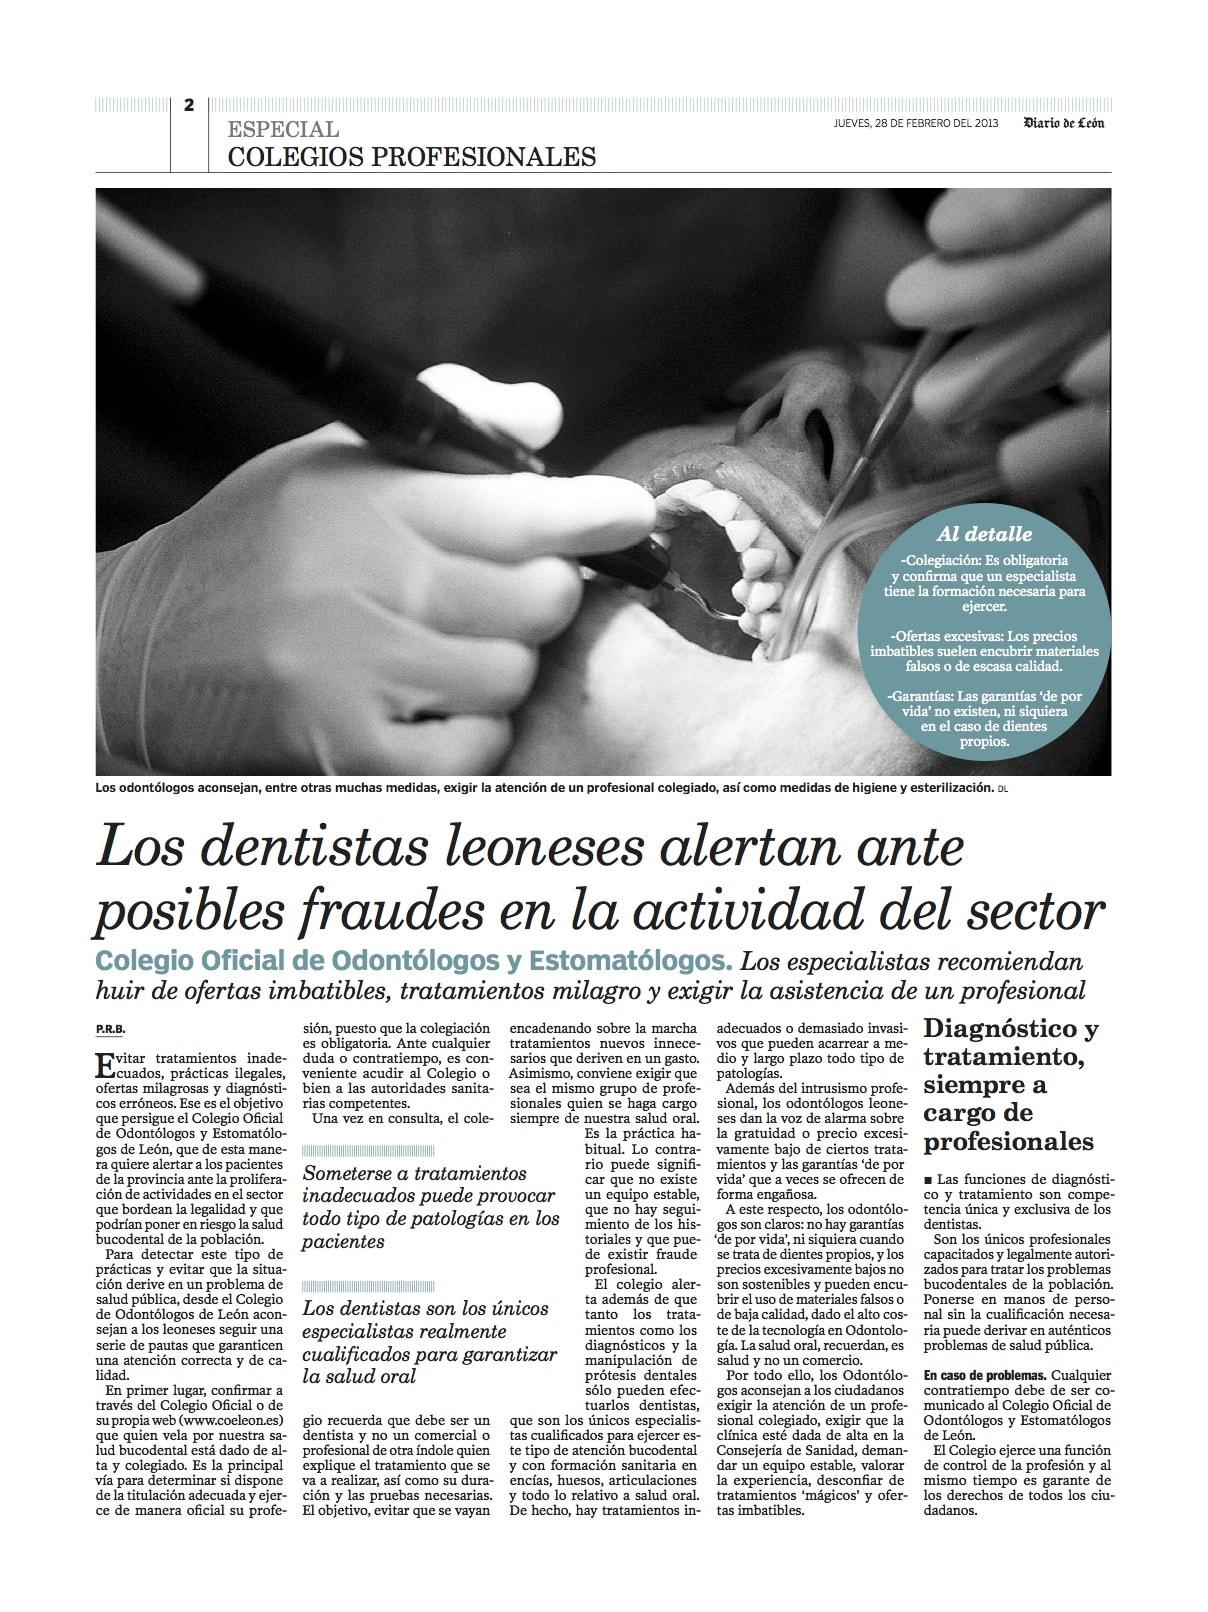 Diario-de-leon-28-2-2013-3